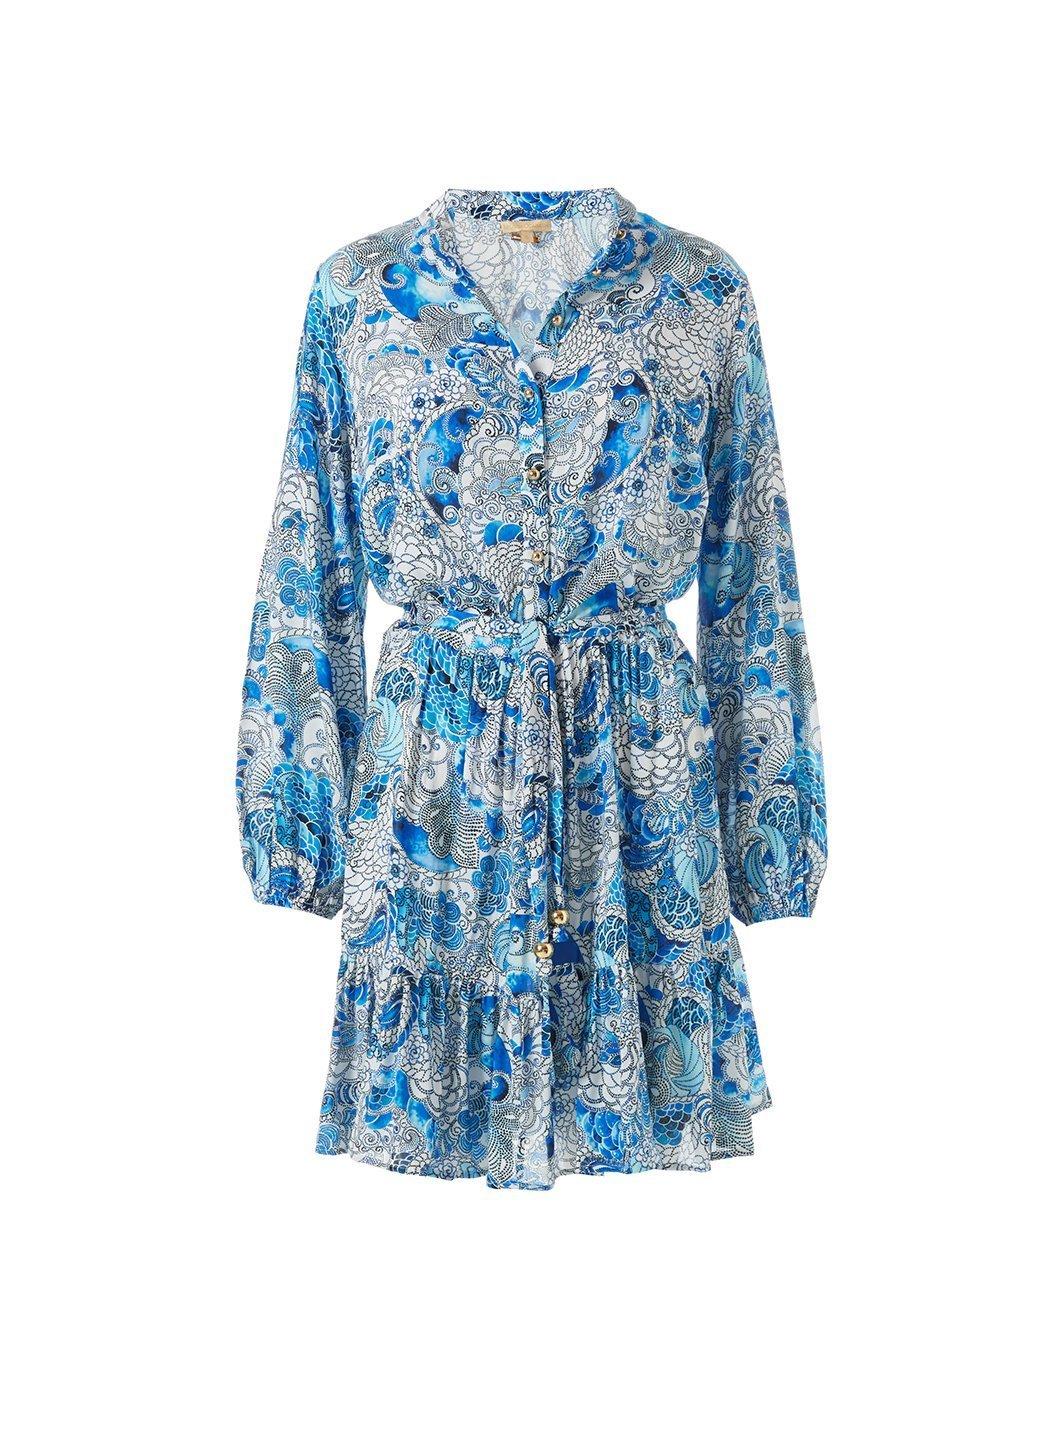 Bluebird_Fantasy_Dress_Cutouts_1056x.progressive